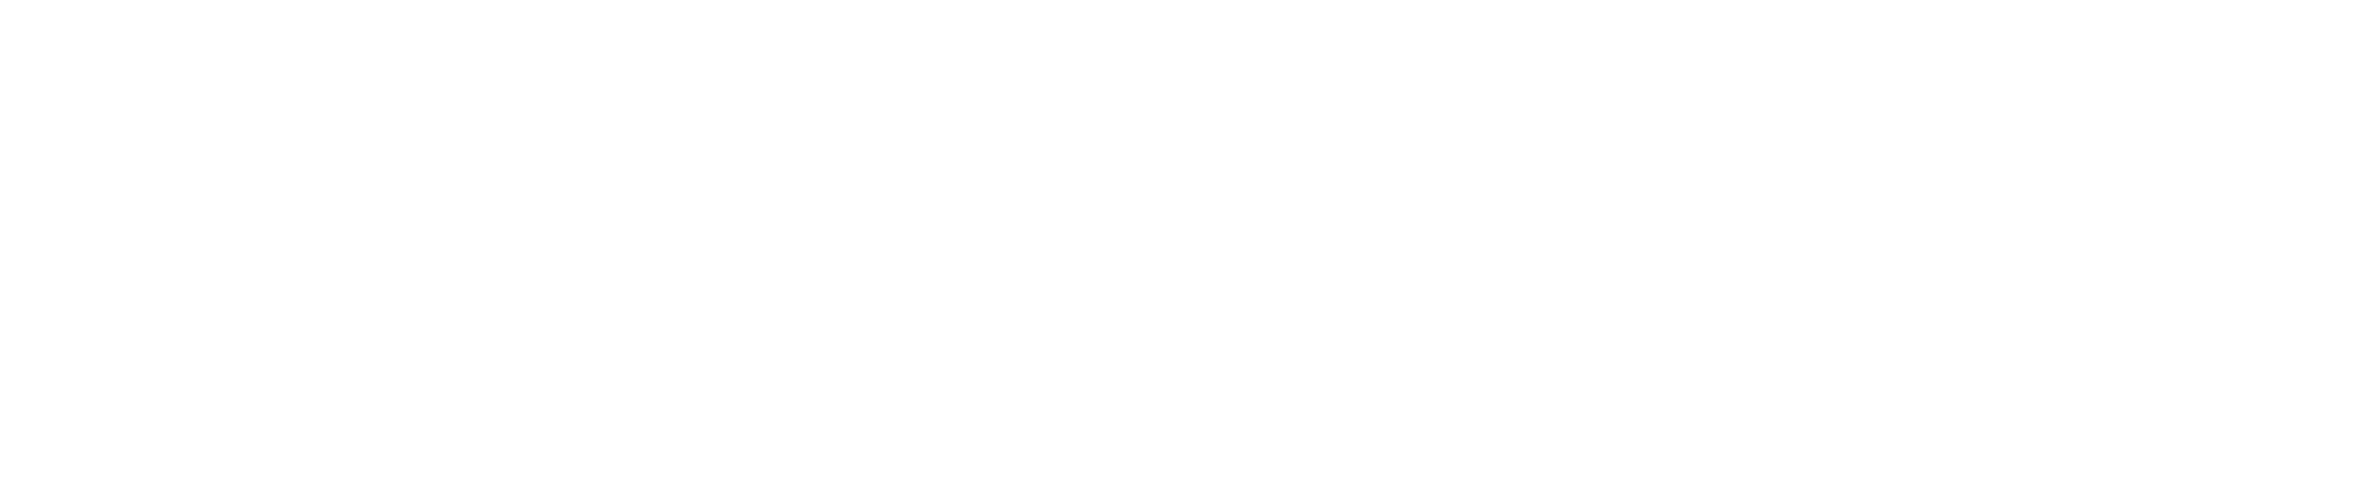 FitzVirtual Logo